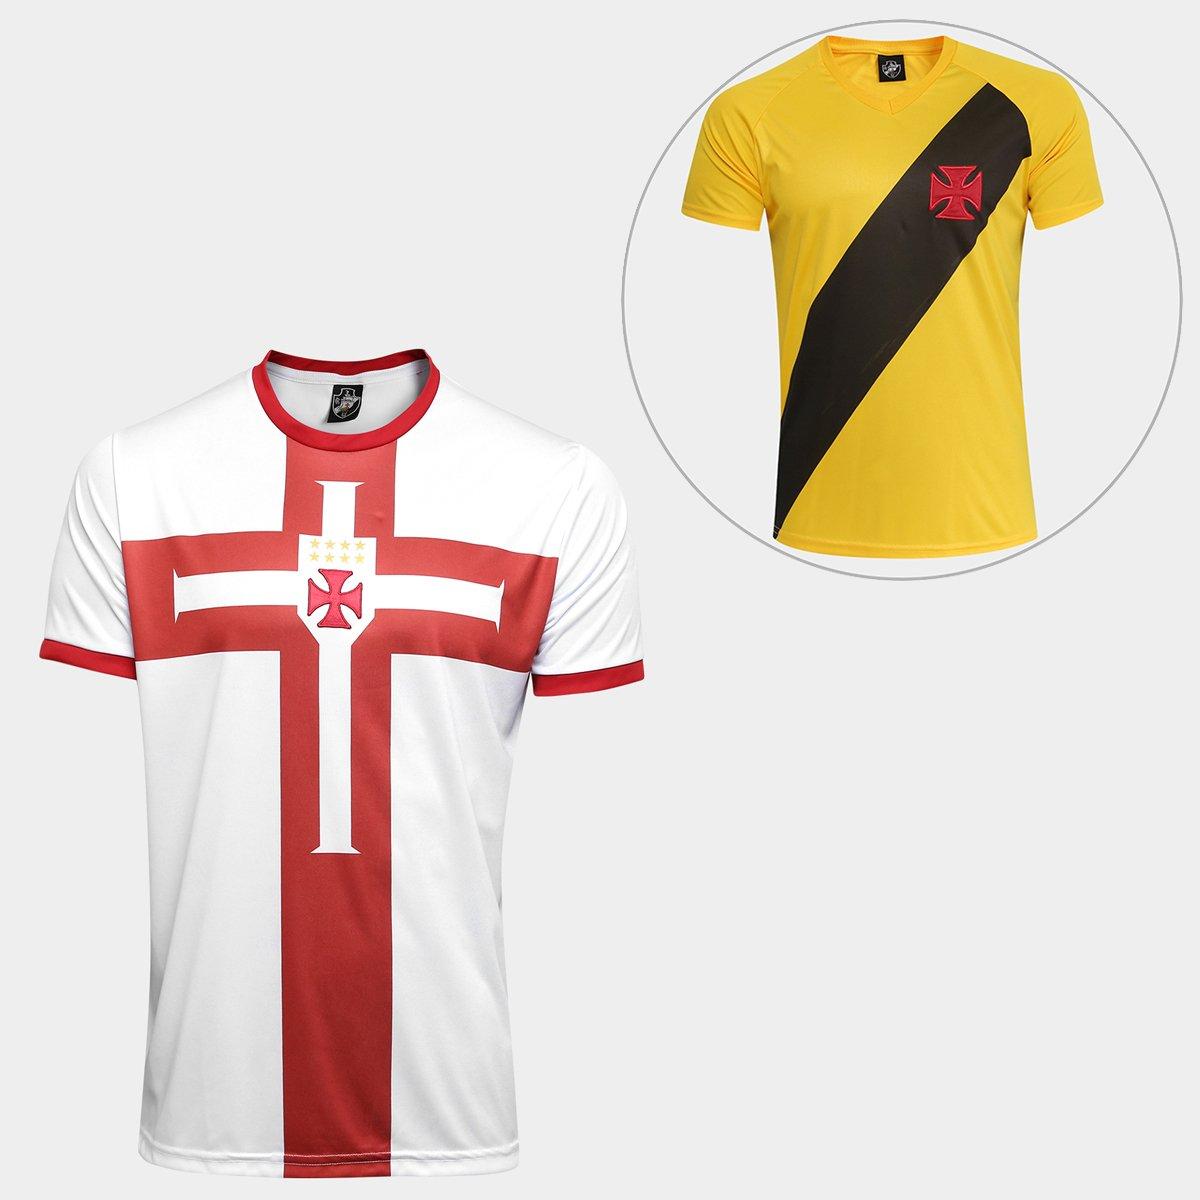 c5722fba25 Kit Camisa Vasco Templária + Camisa Vasco 2012 - Branco e Vermelho ...